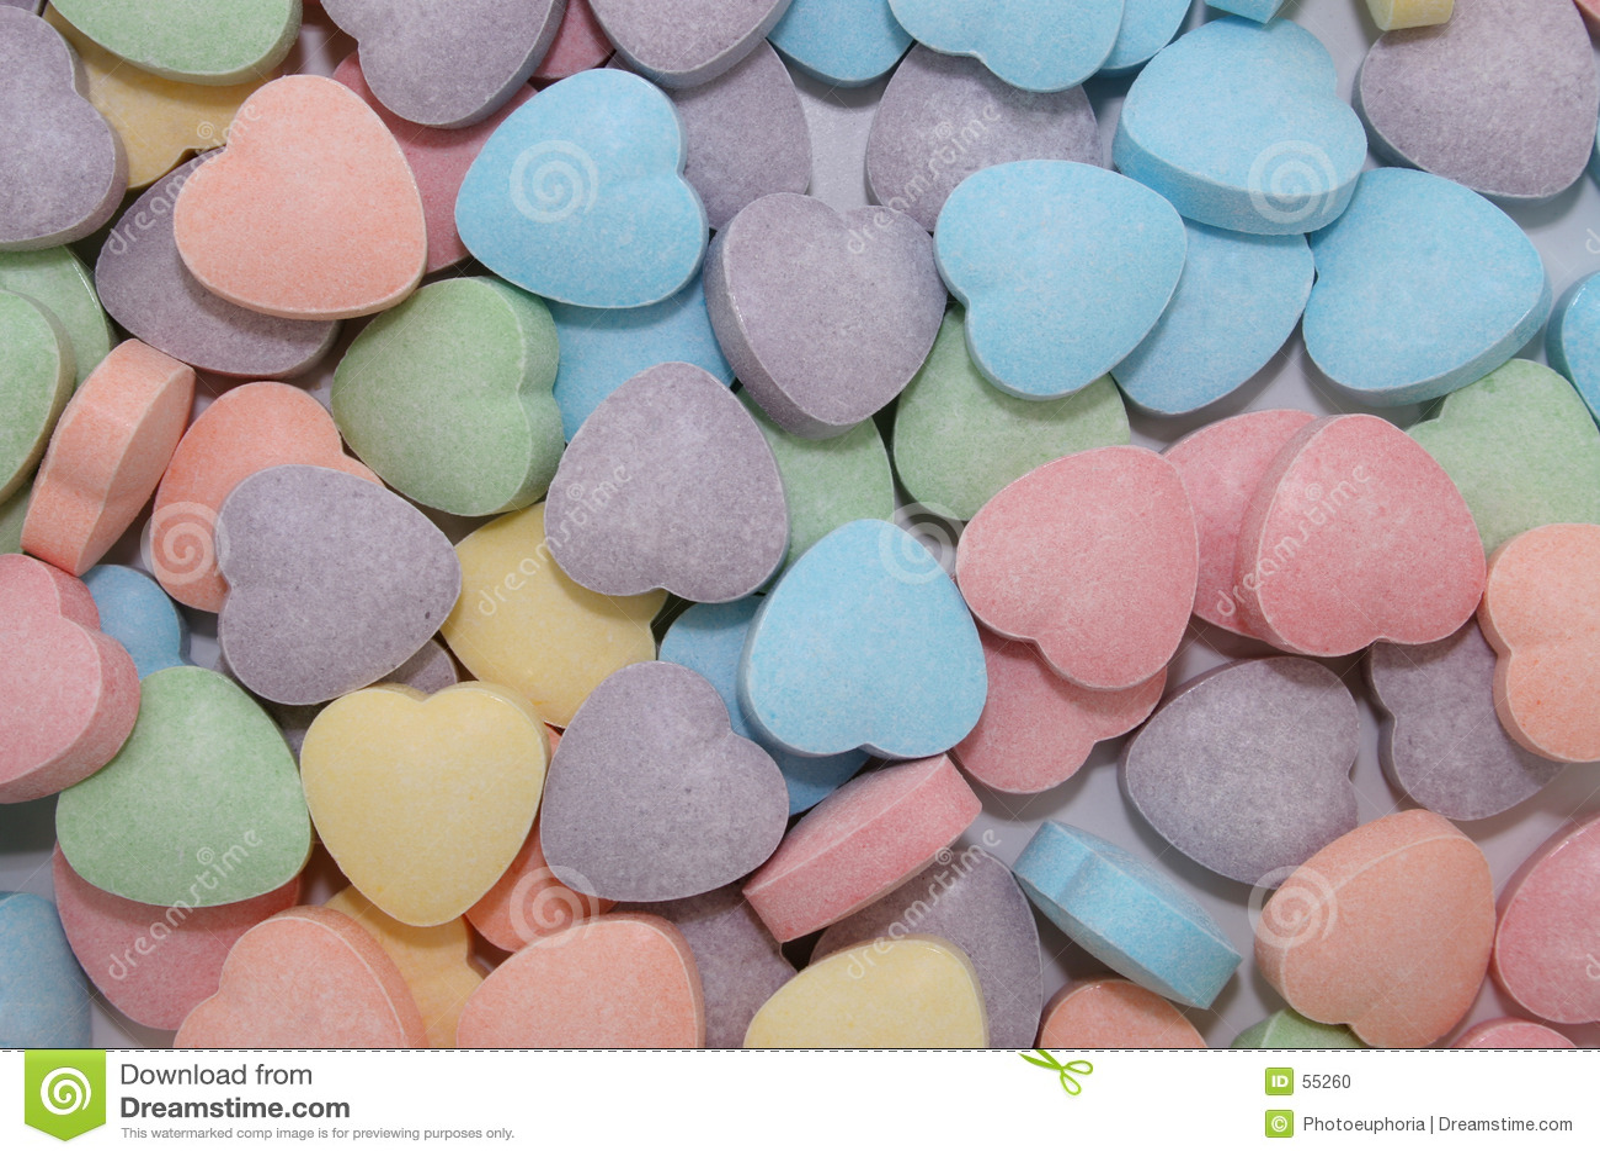 Download 2mp 8 εικόνα καρδιών καραμελών ανασκόπησης Στοκ Εικόνες - εικόνα από πορφυρός, βαλεντίνος: 55260